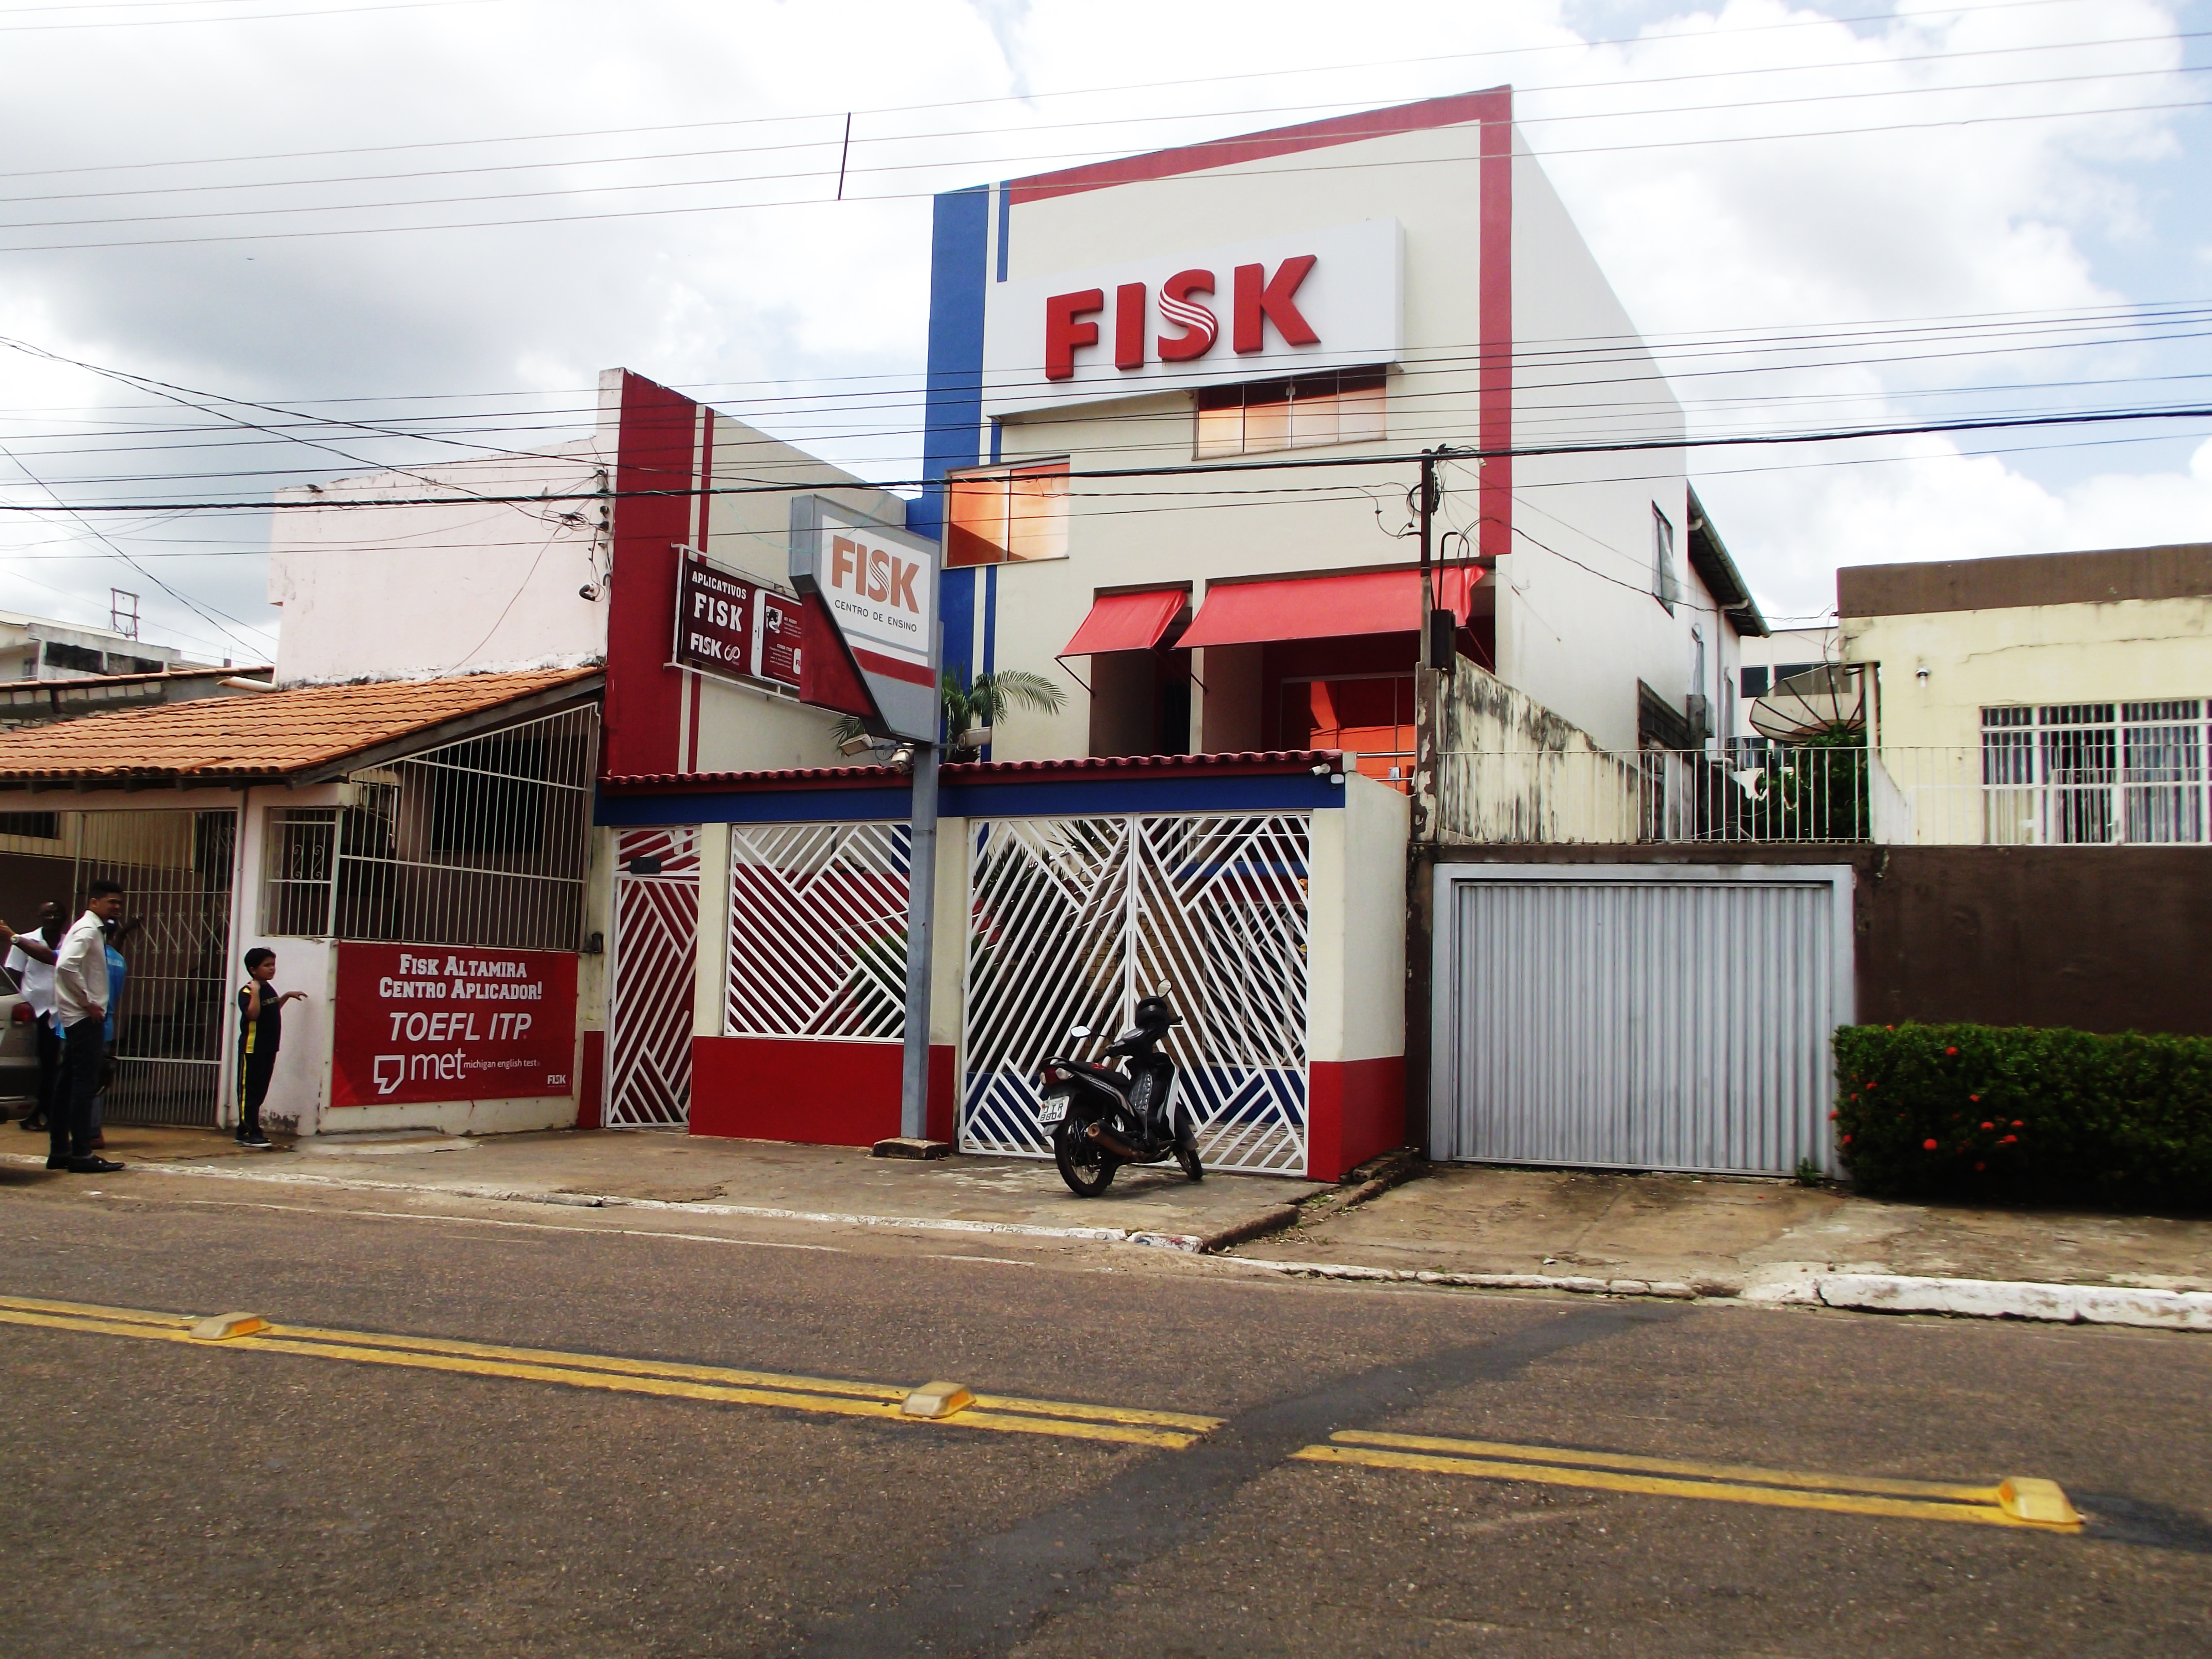 Fisk altamira